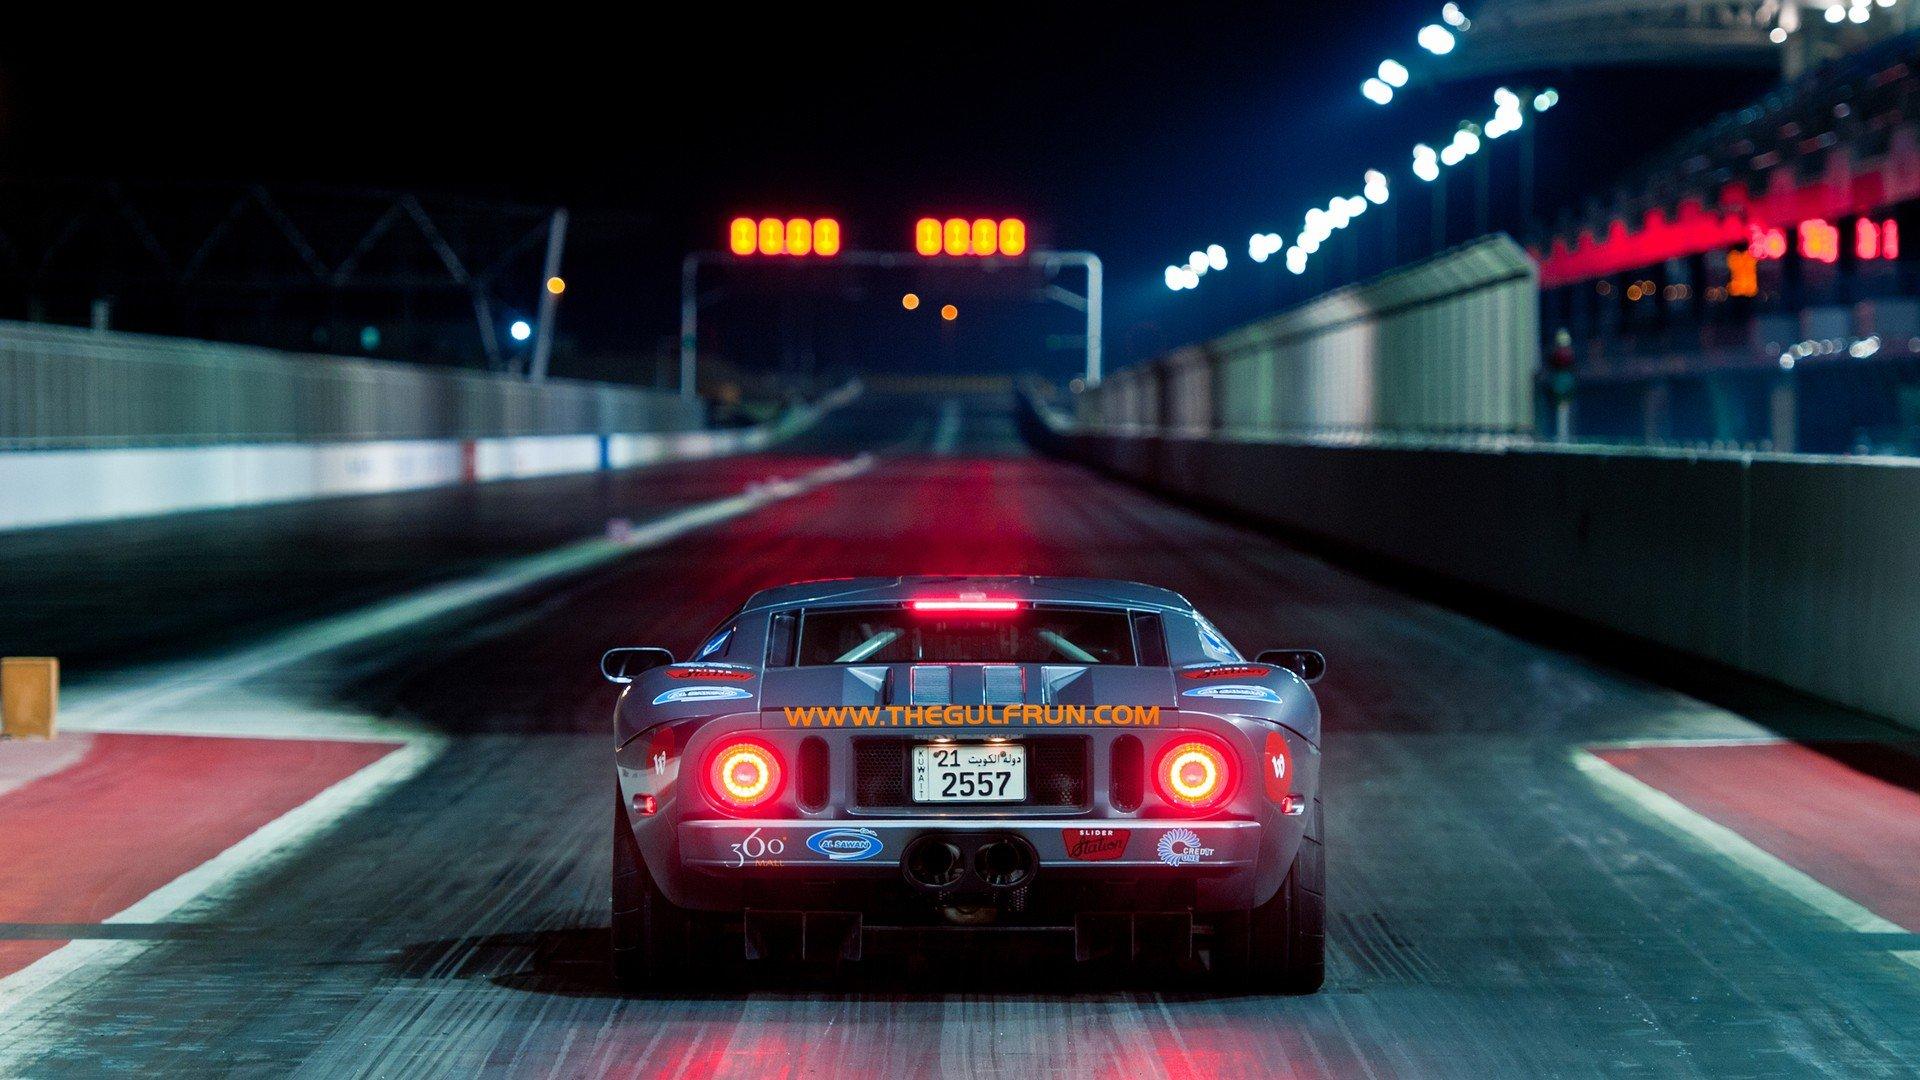 cars ford gt drag racing drag cars wallpaper 1920x1080